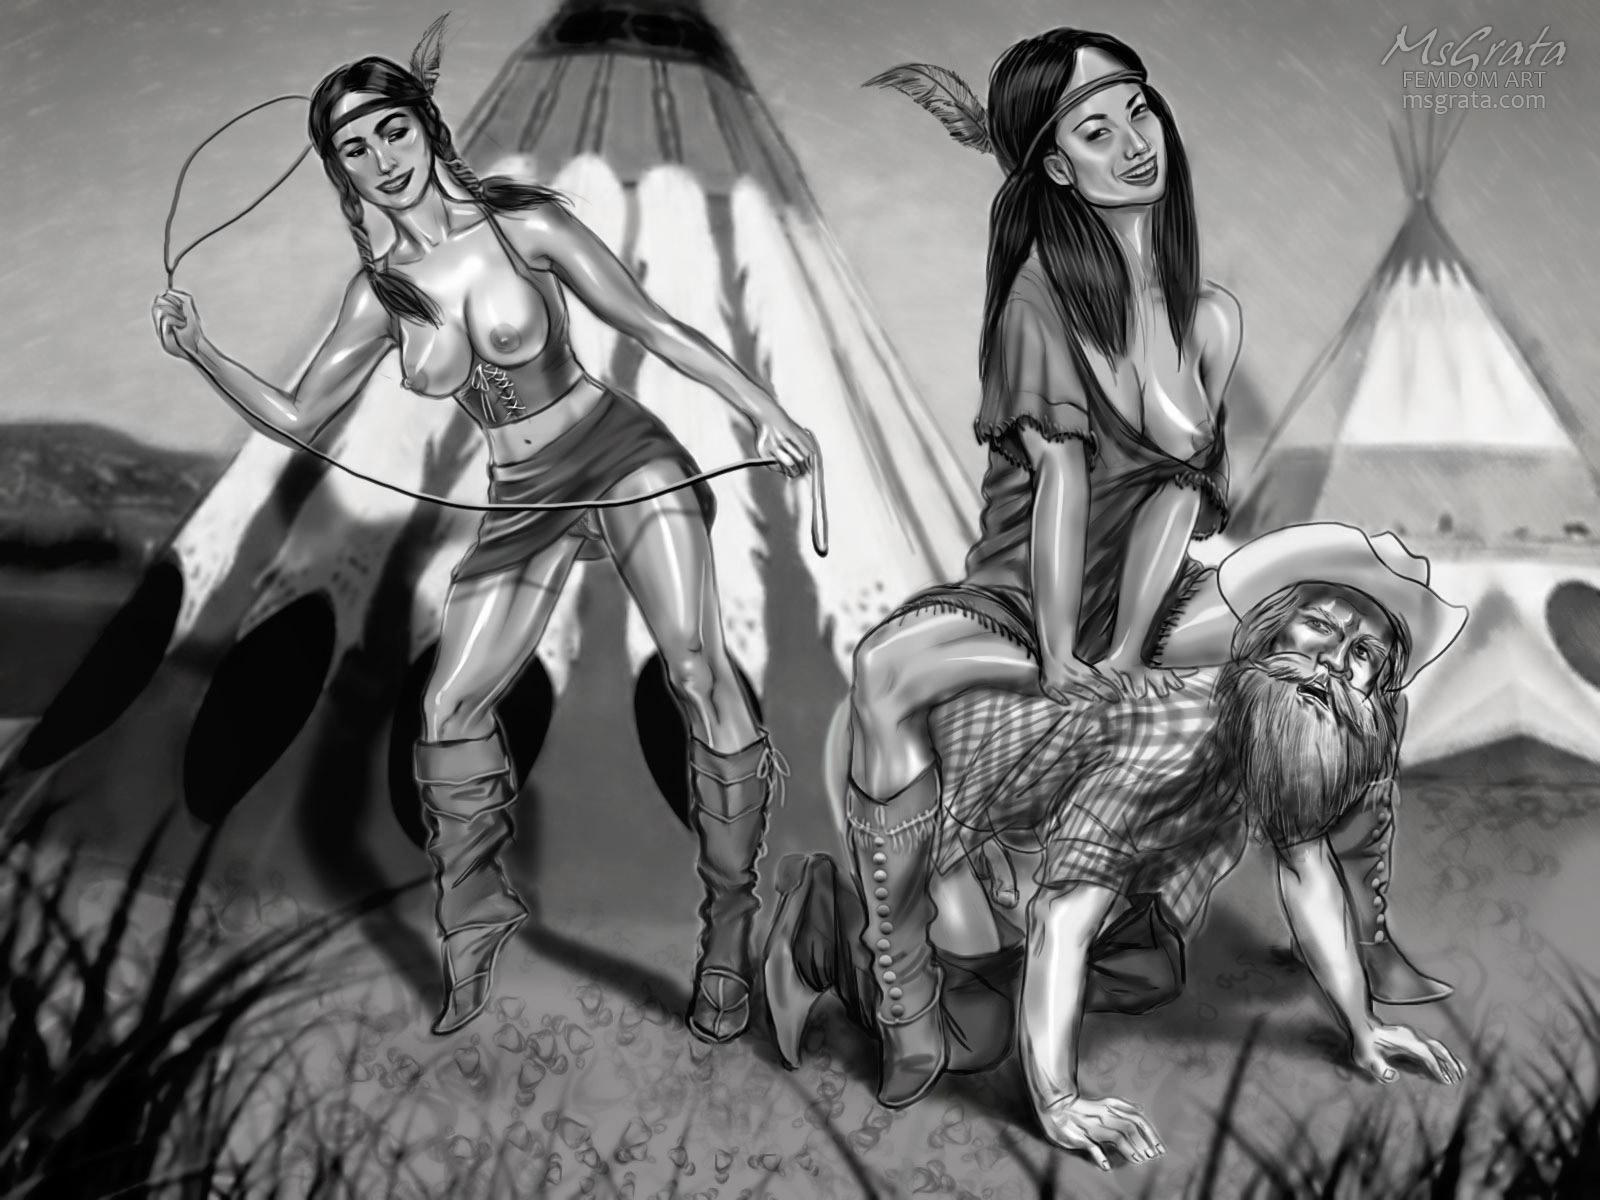 Public humiliation Funny Indian Summer femdom art fantasy by MsGrata